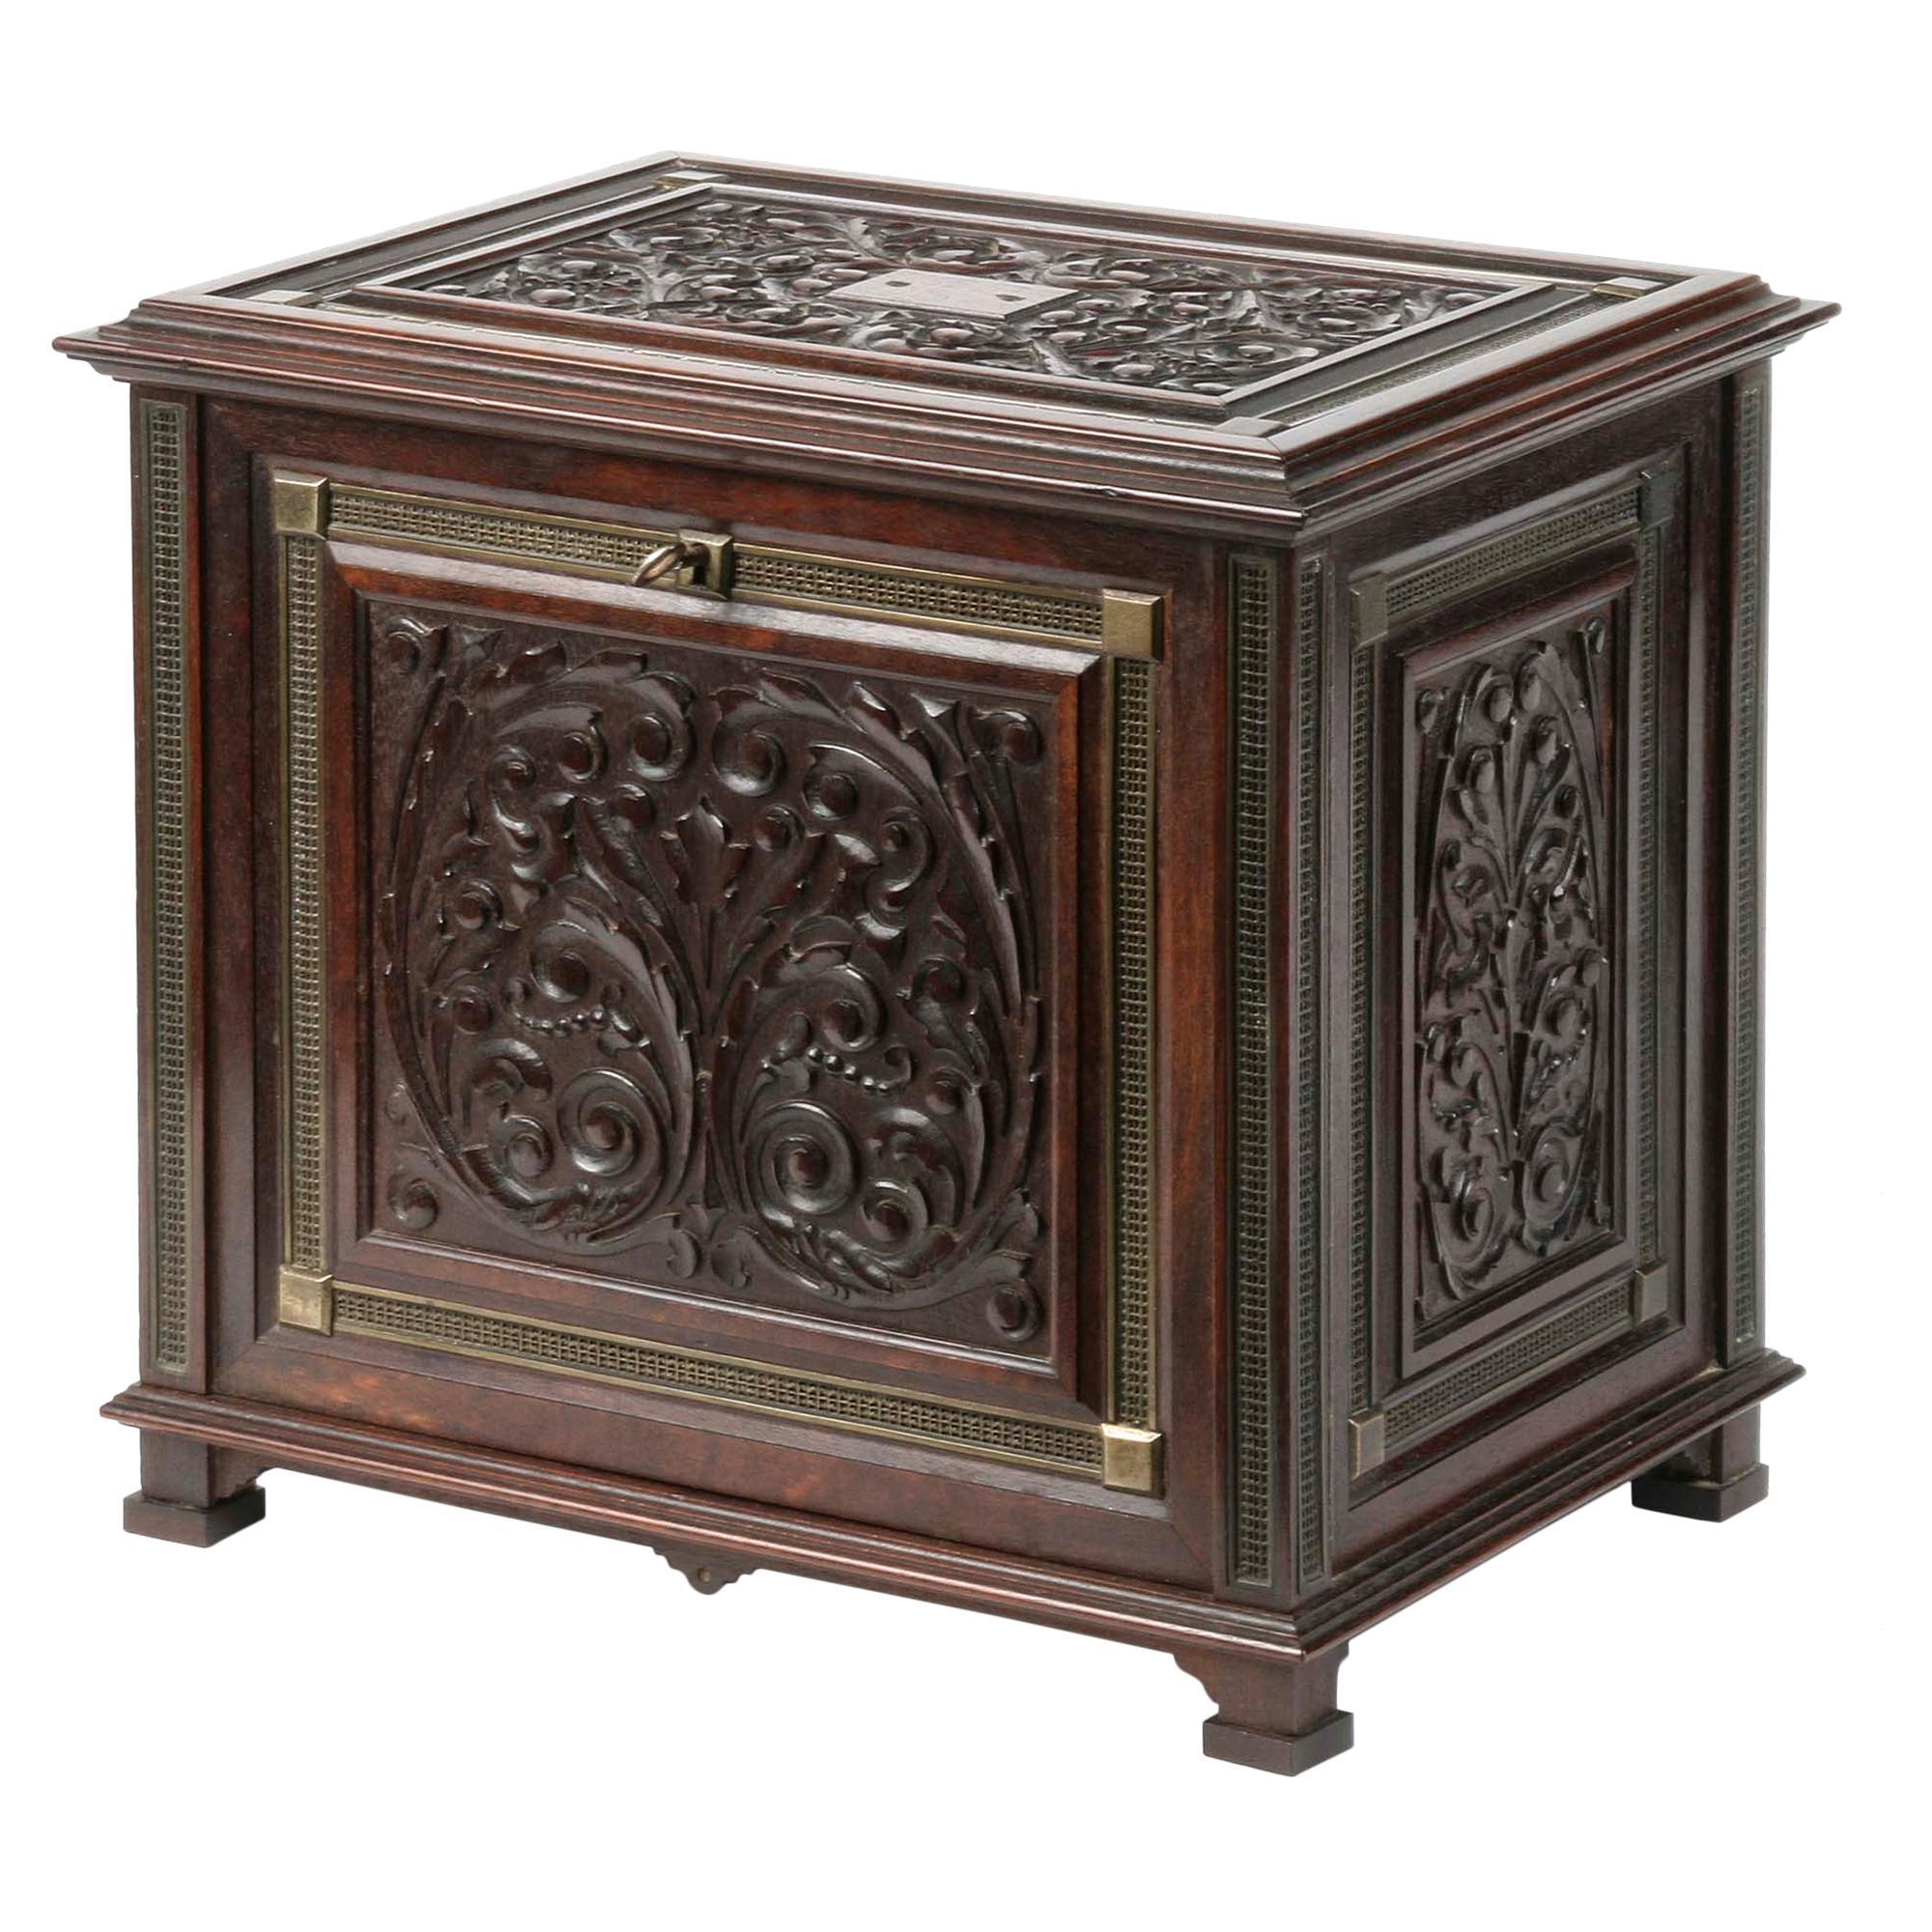 Victorian Mahogany Carved Cigar Box, 19th Century